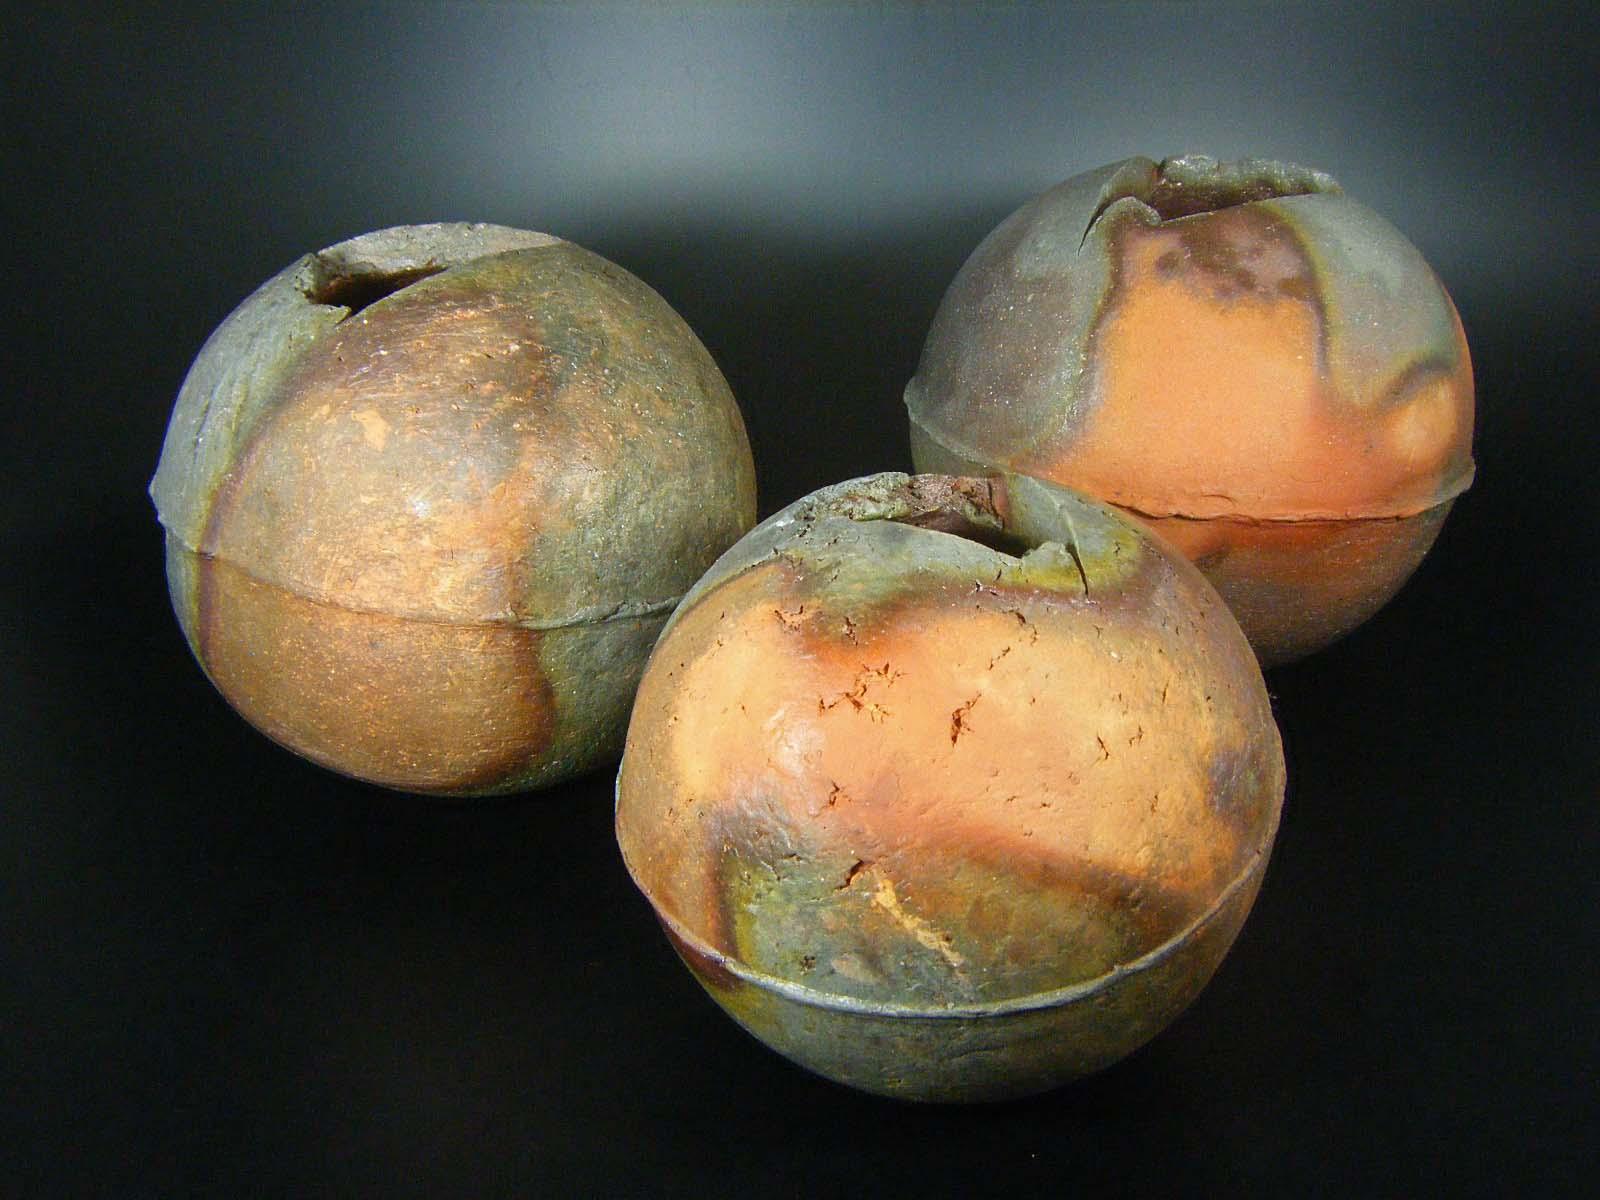 9-10-19-balls-all